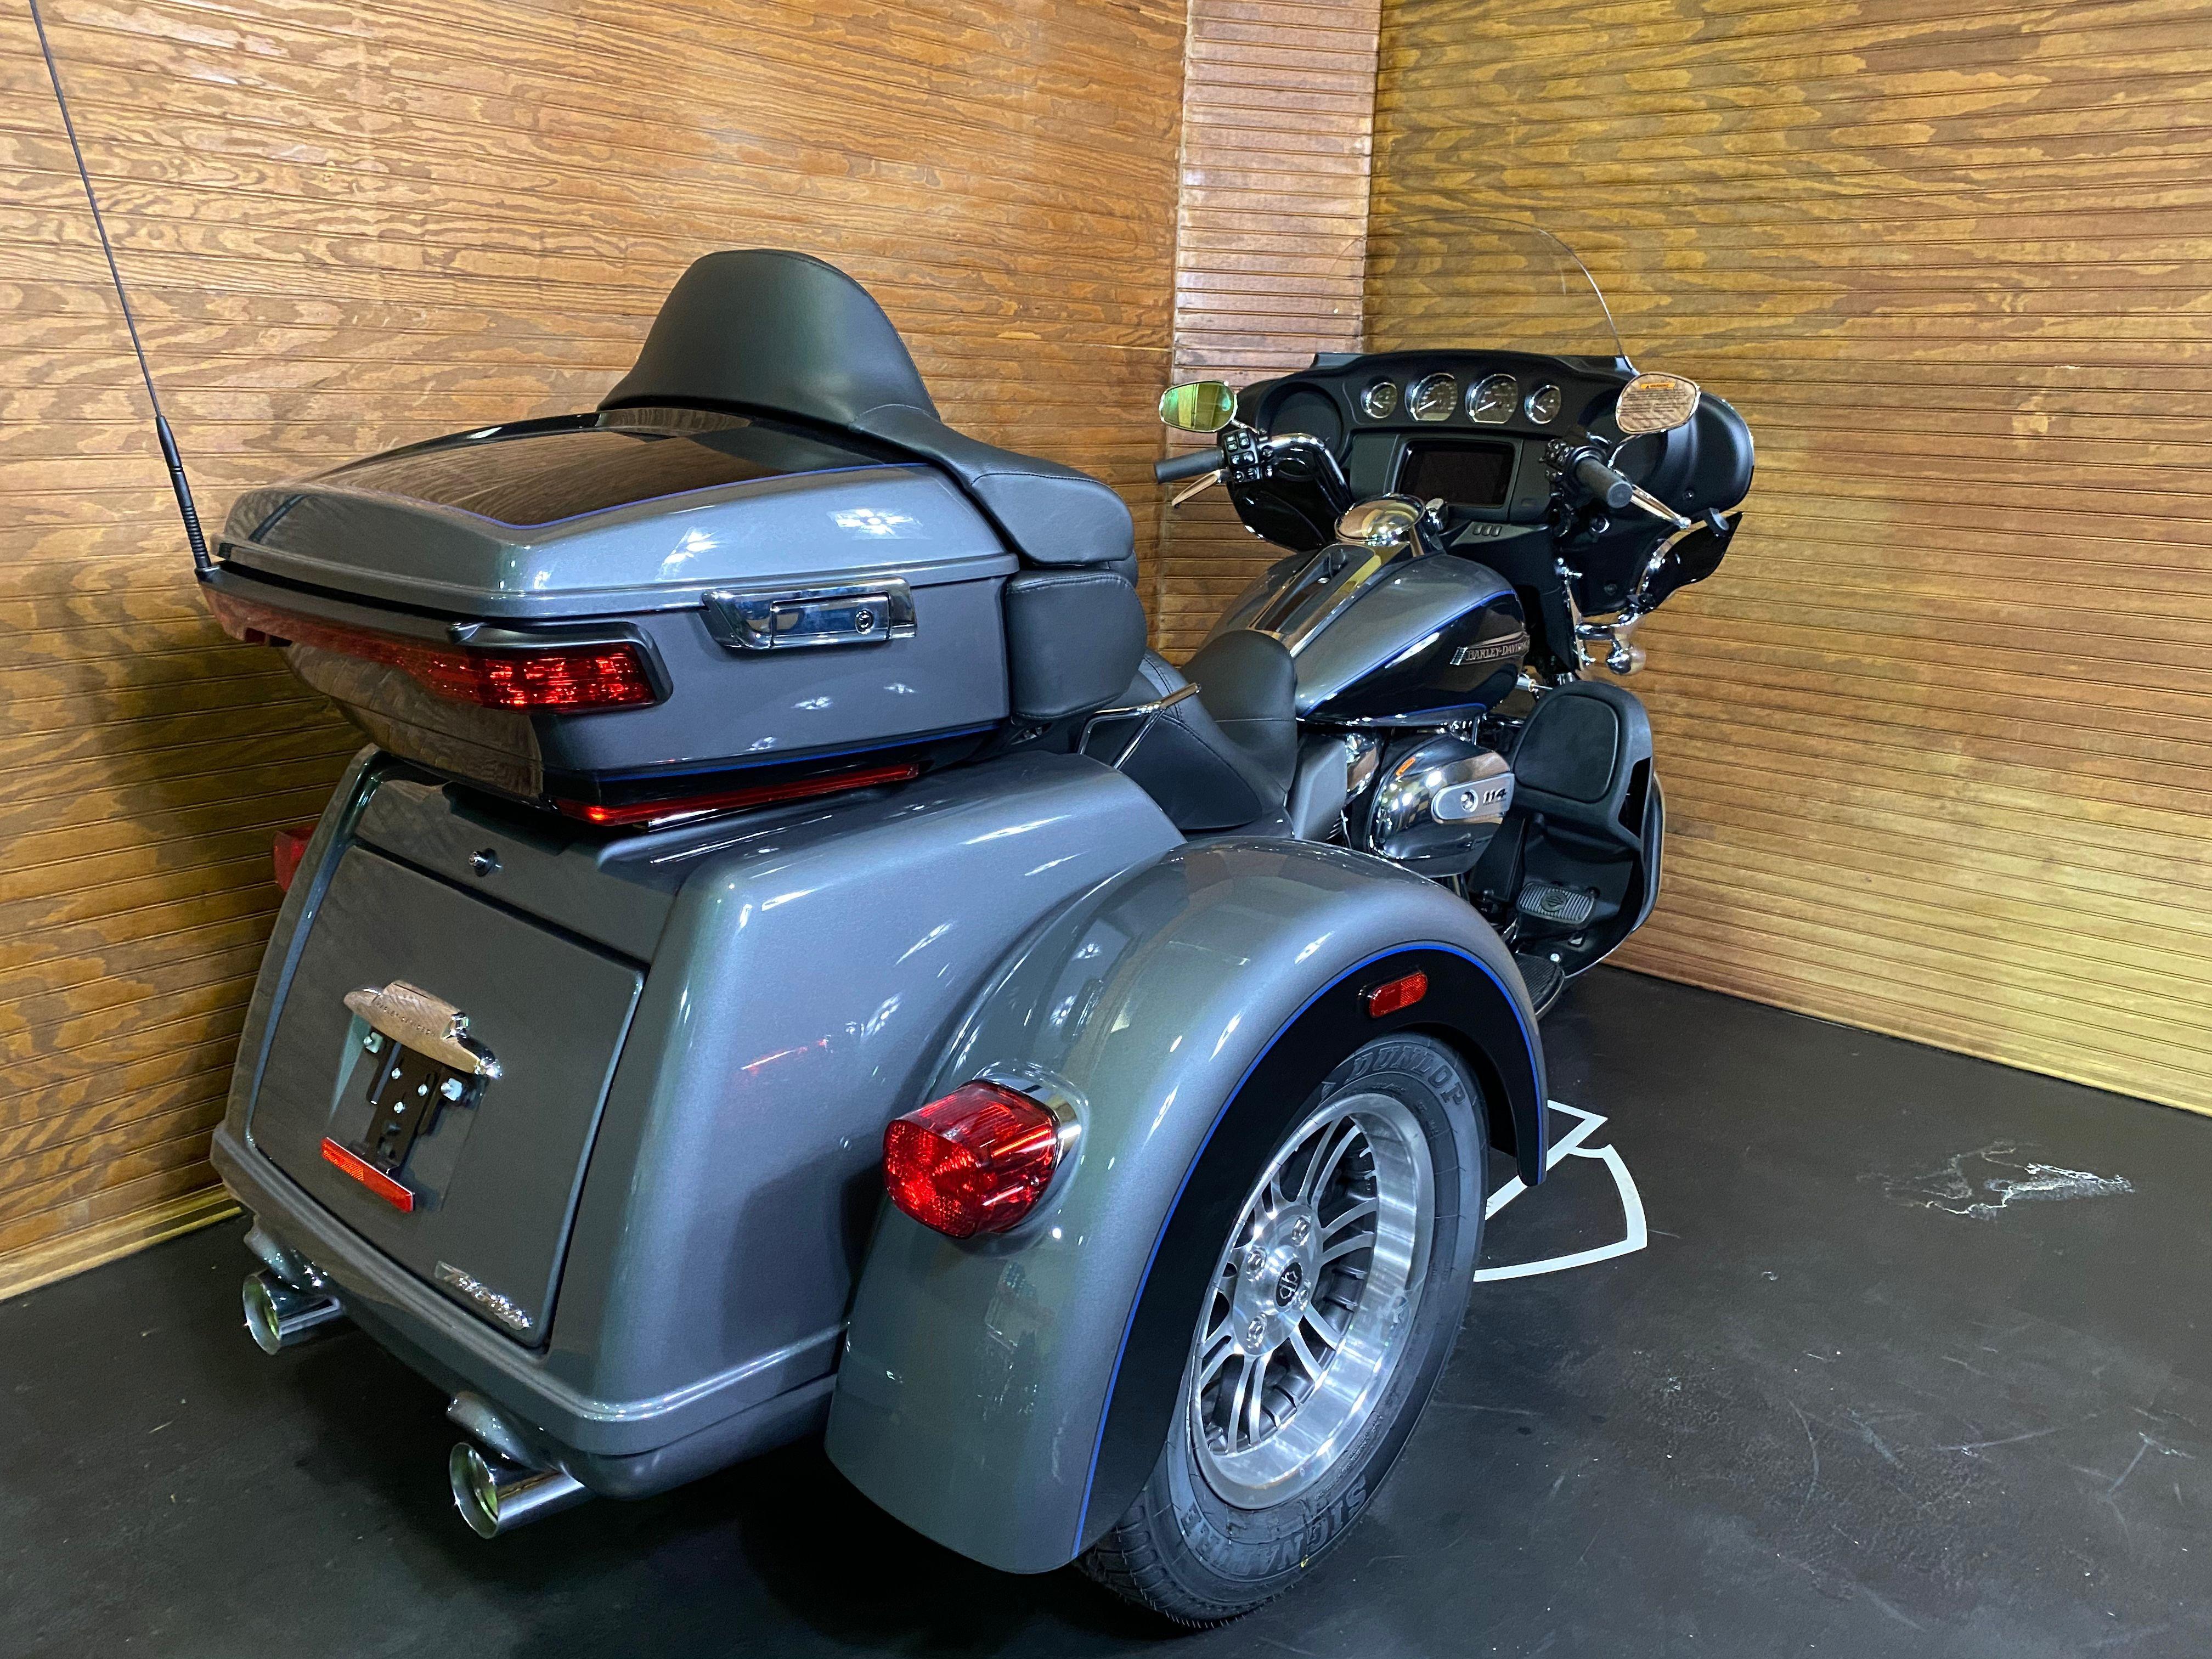 New 2021 Harley-Davidson Tri Glide Ultra